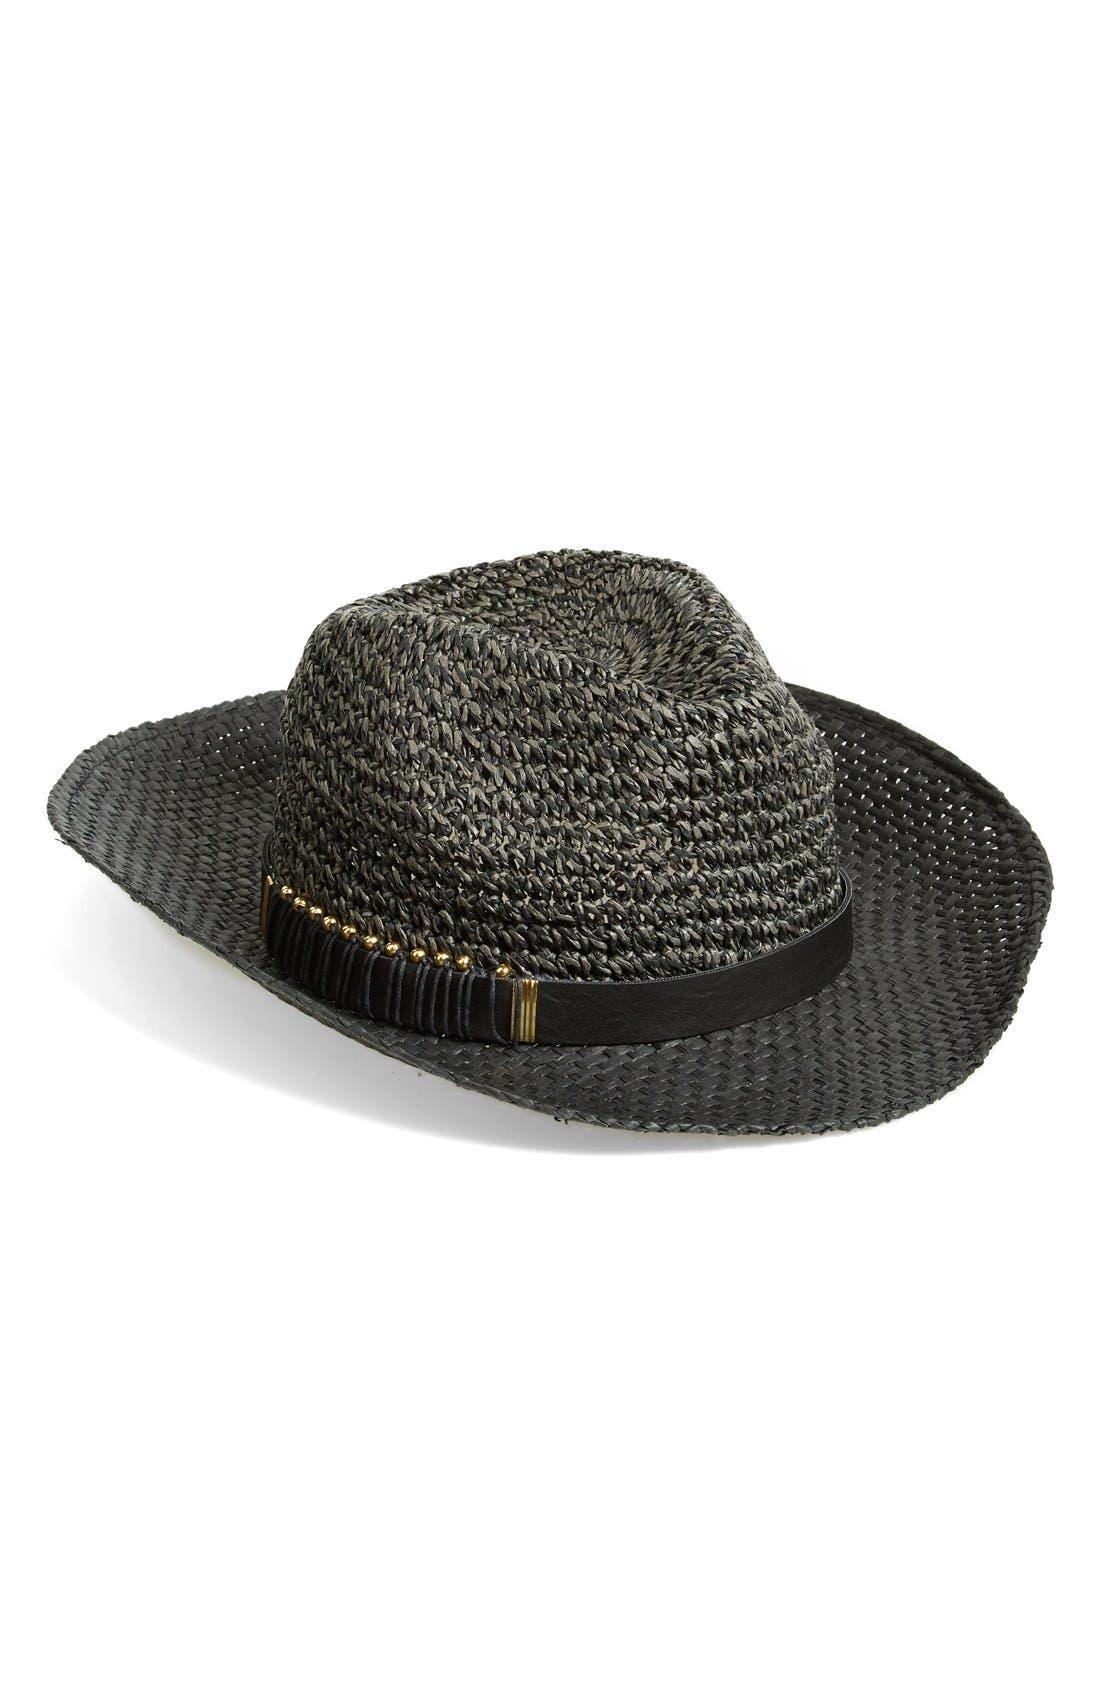 Alternate Image 1 Selected - Jessica Simpson Metal Accented Panama Hat